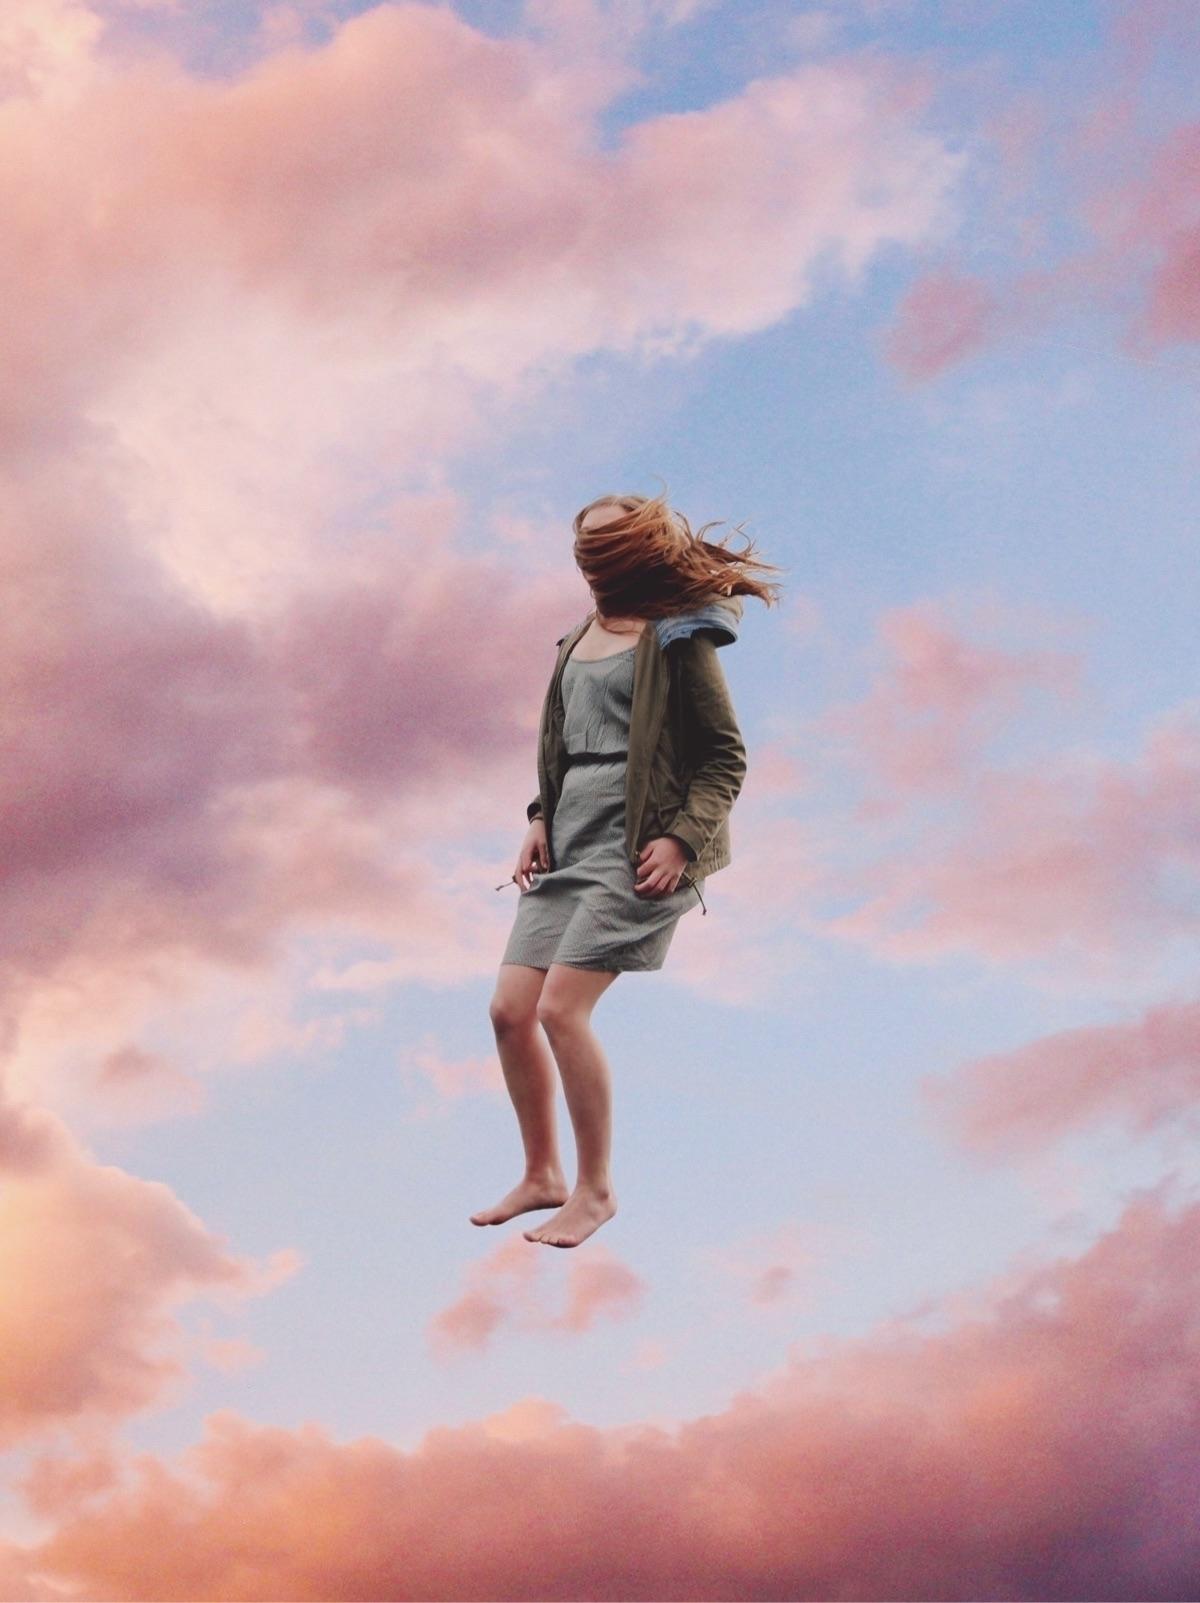 Time wake - photography, sky - sammescobar | ello